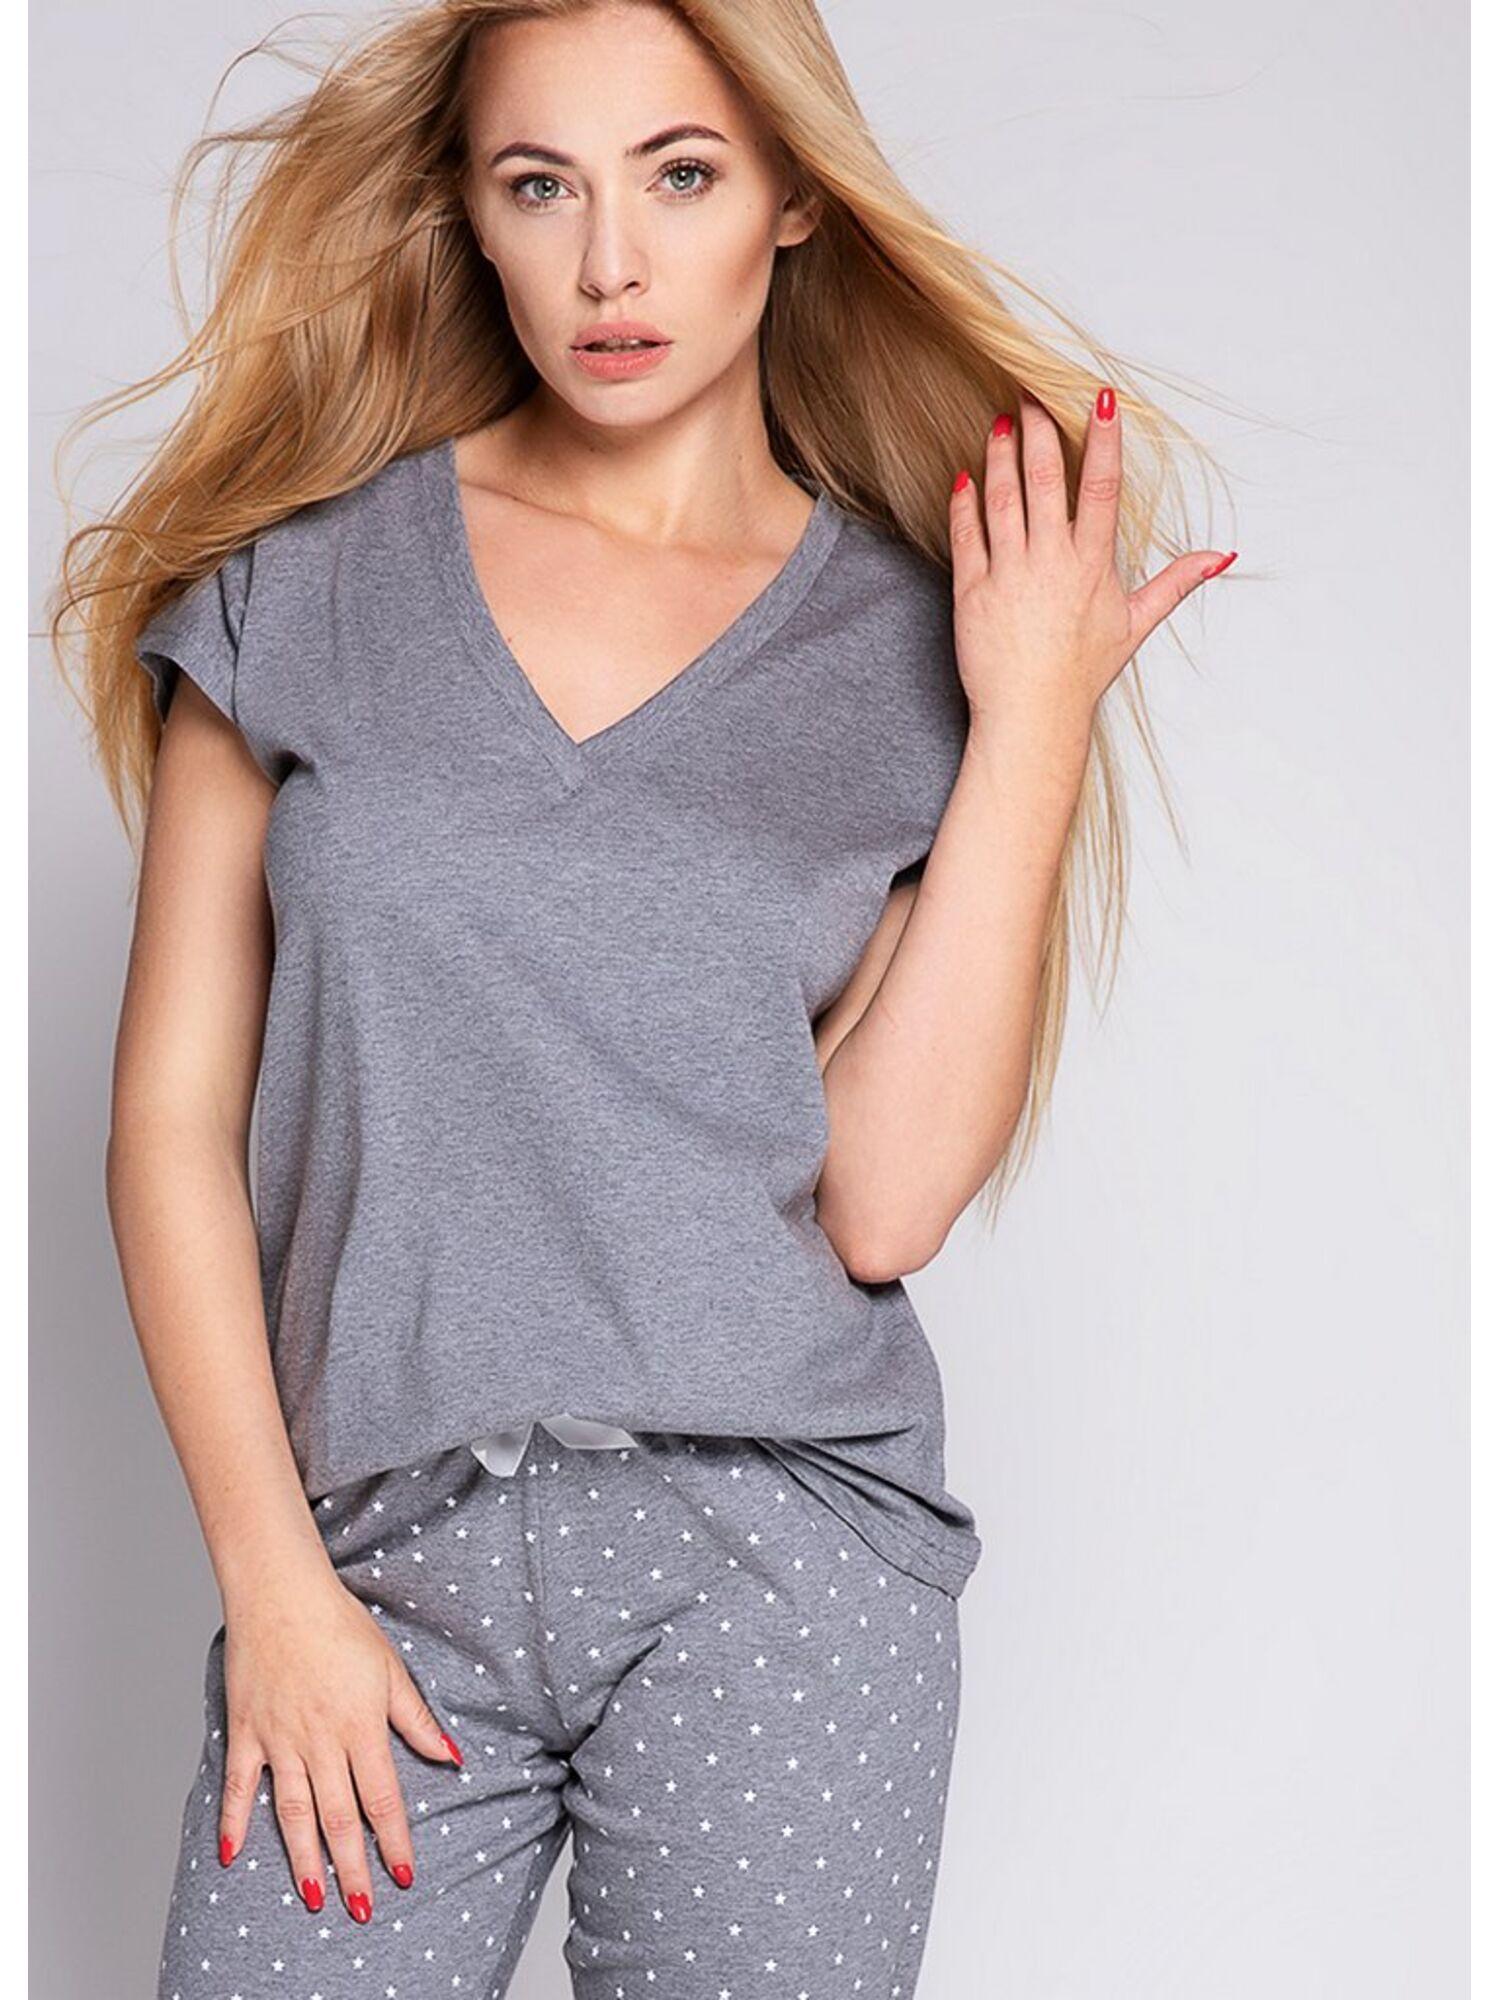 Комплект женский со штанами ANABELL, серый, SENSIS